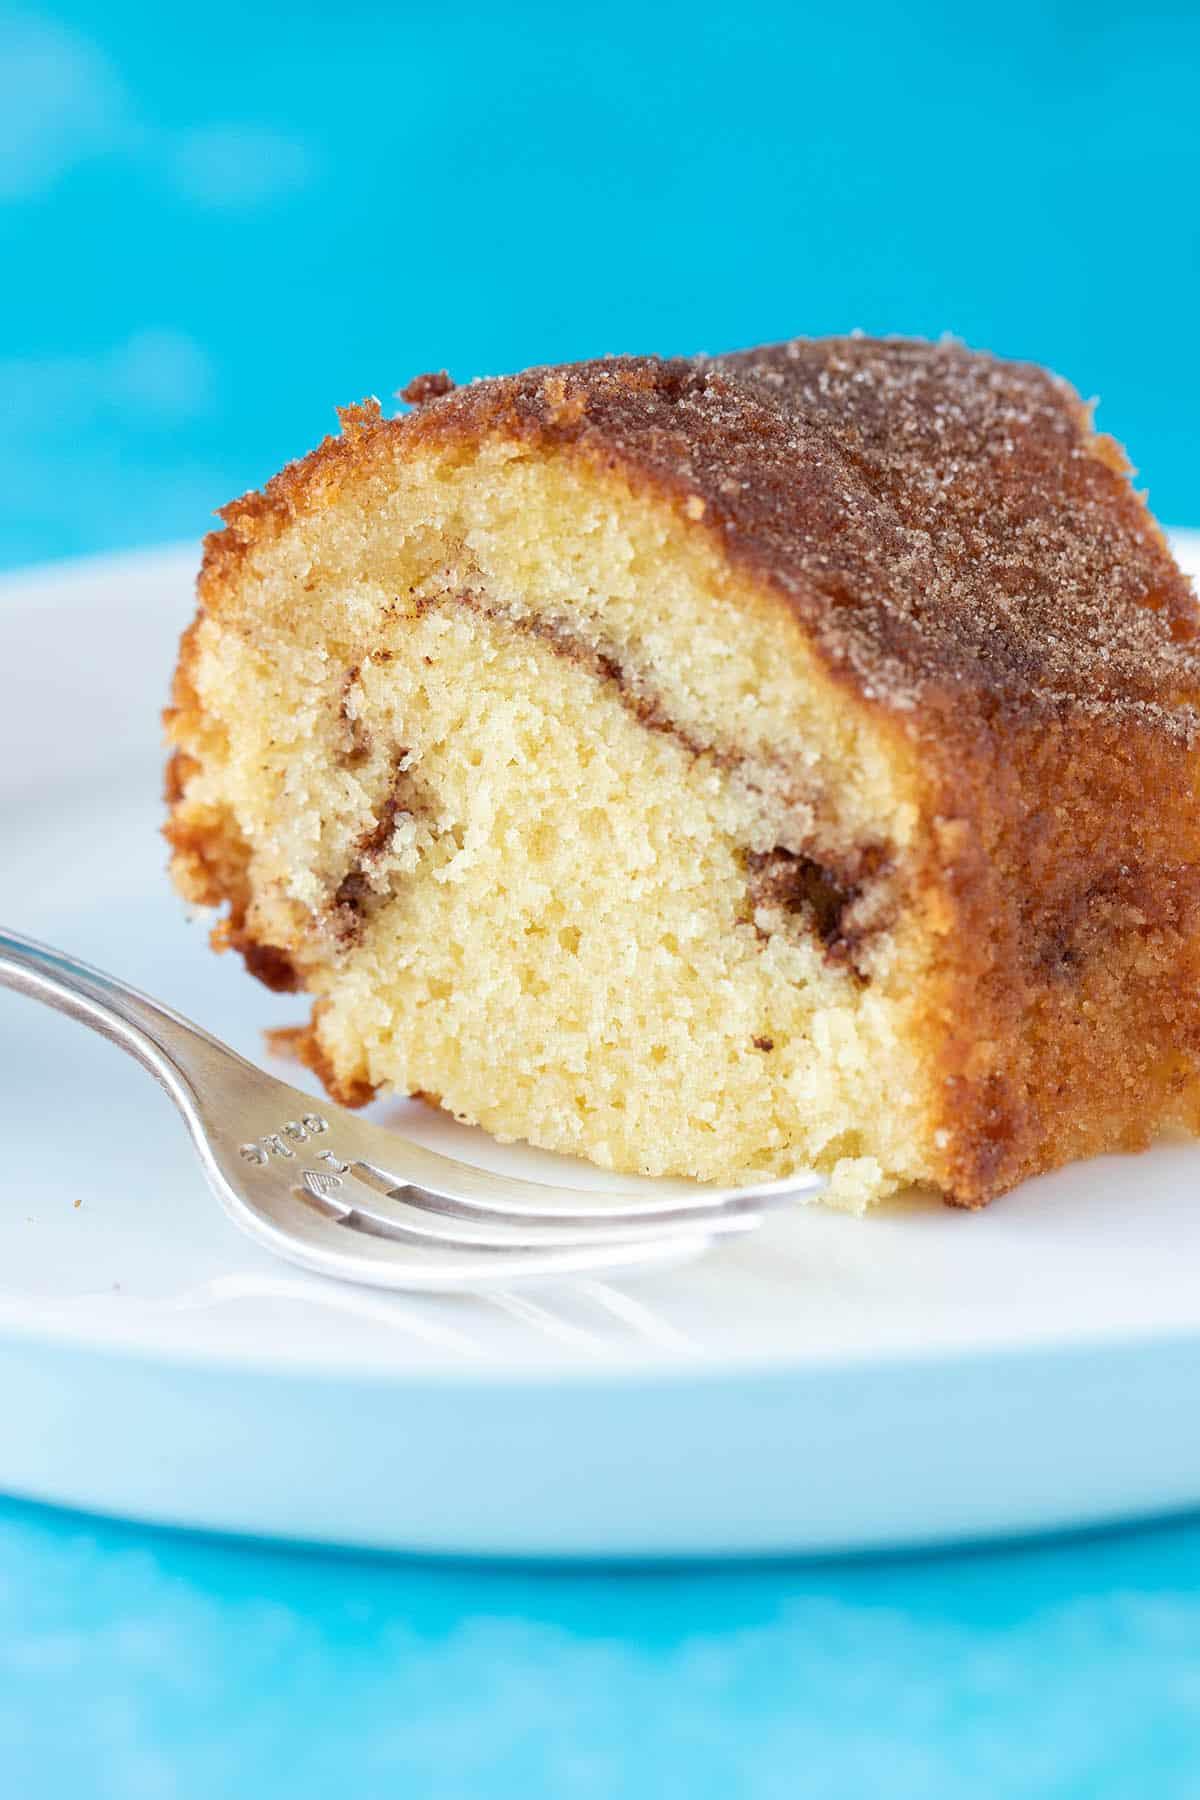 A big slice of cinnamon swirl cake covered in cinnamon sugar